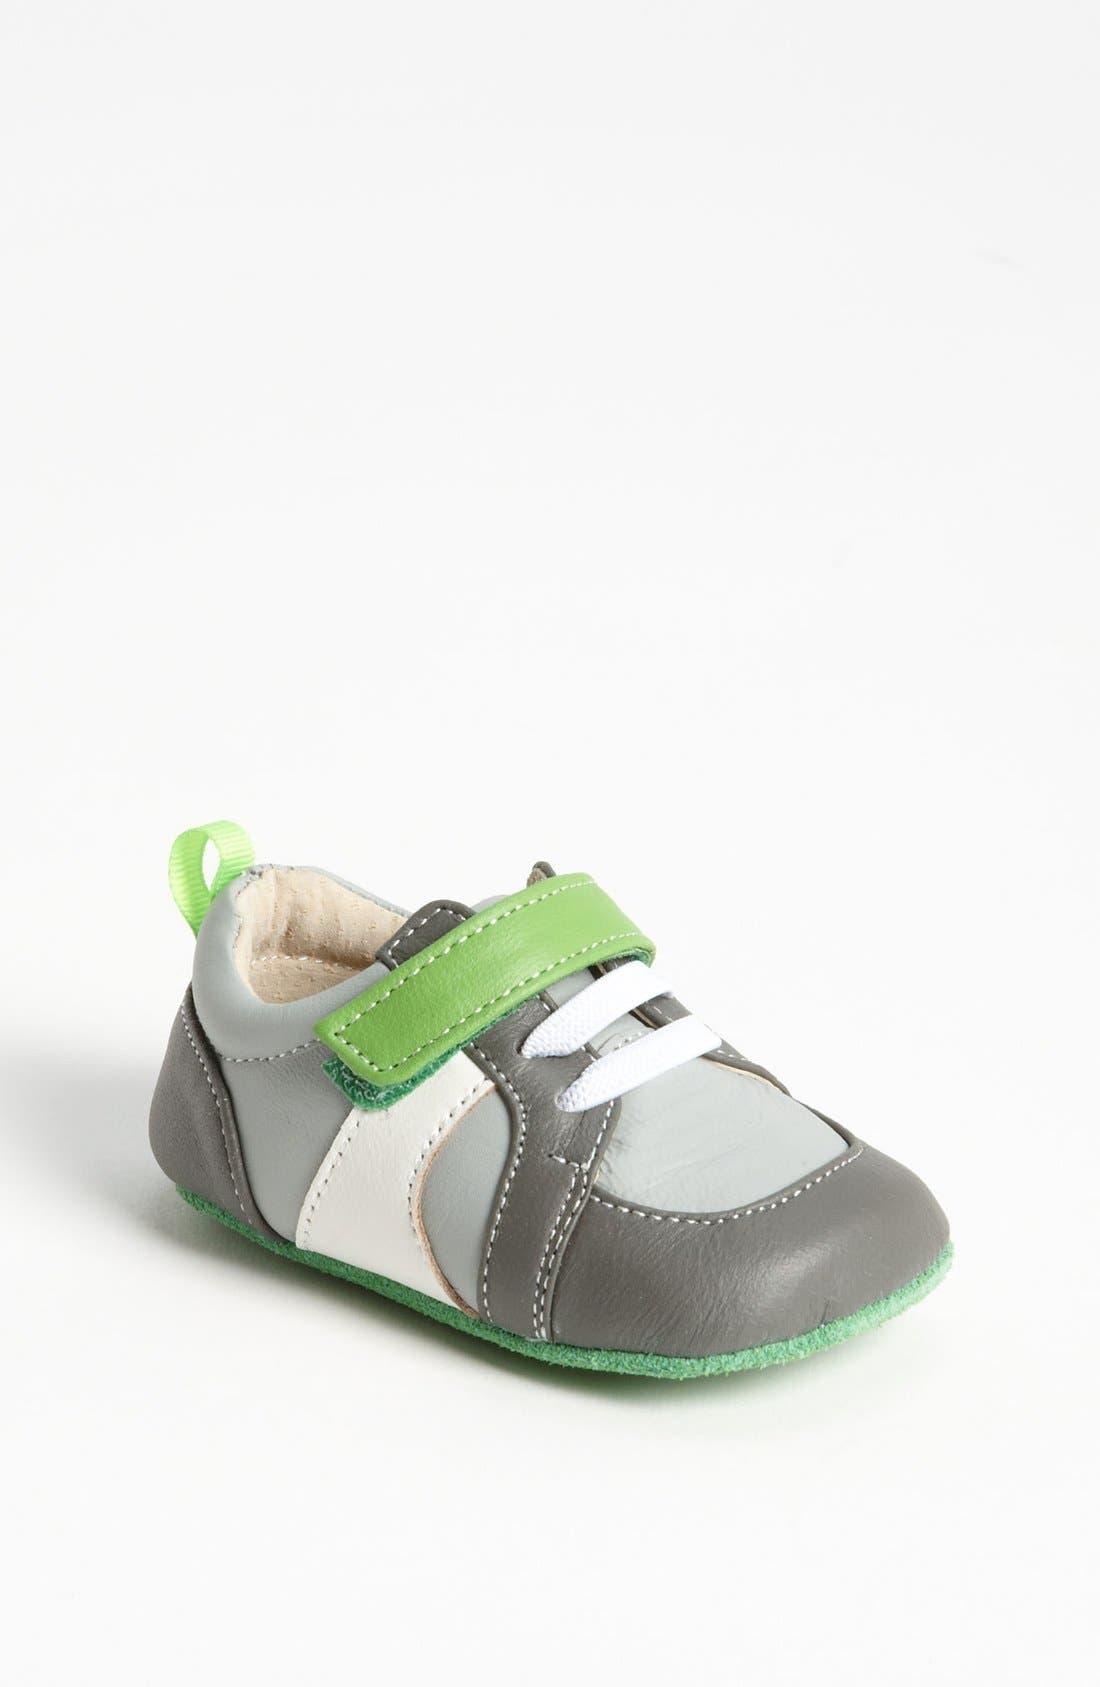 Alternate Image 1 Selected - See Kai Run 'Tyler' Shoe (Baby & Walker)